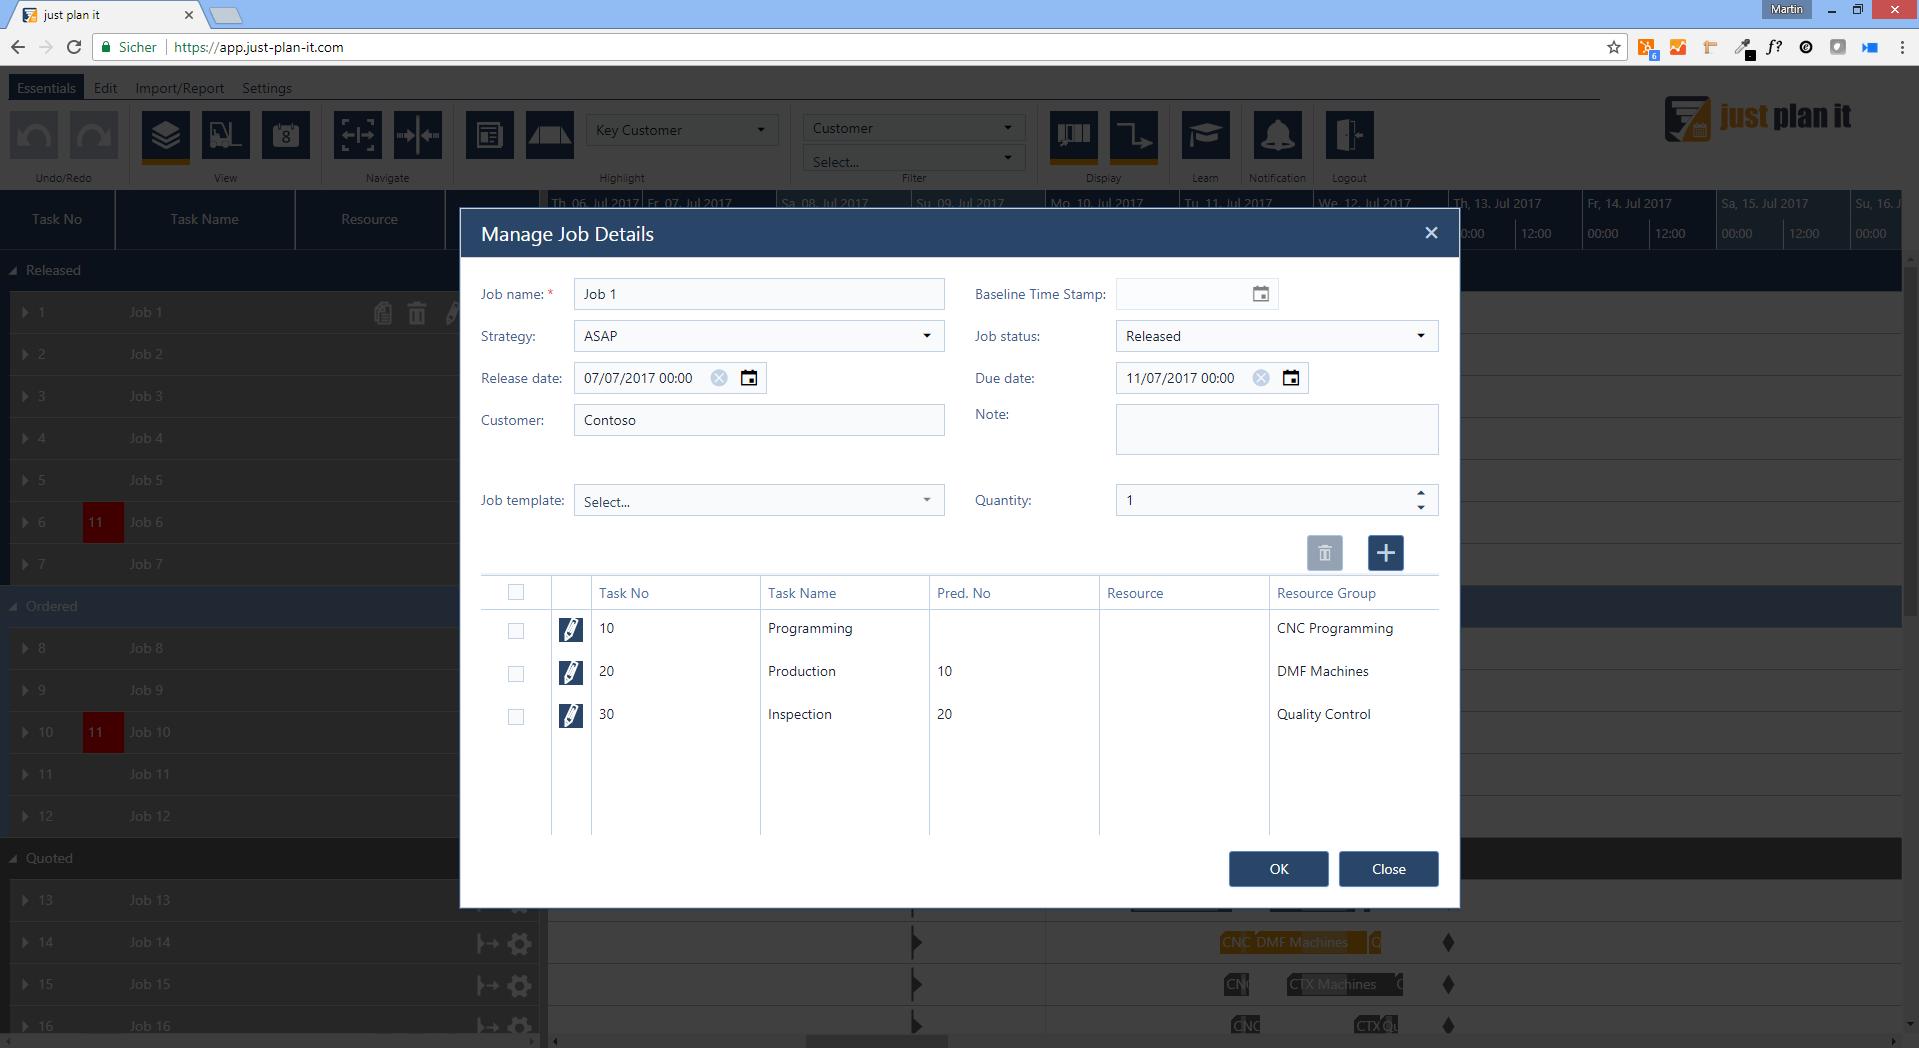 Jop Shop Scheduling Software | Create a new job | just plan it - made by NETRONIC